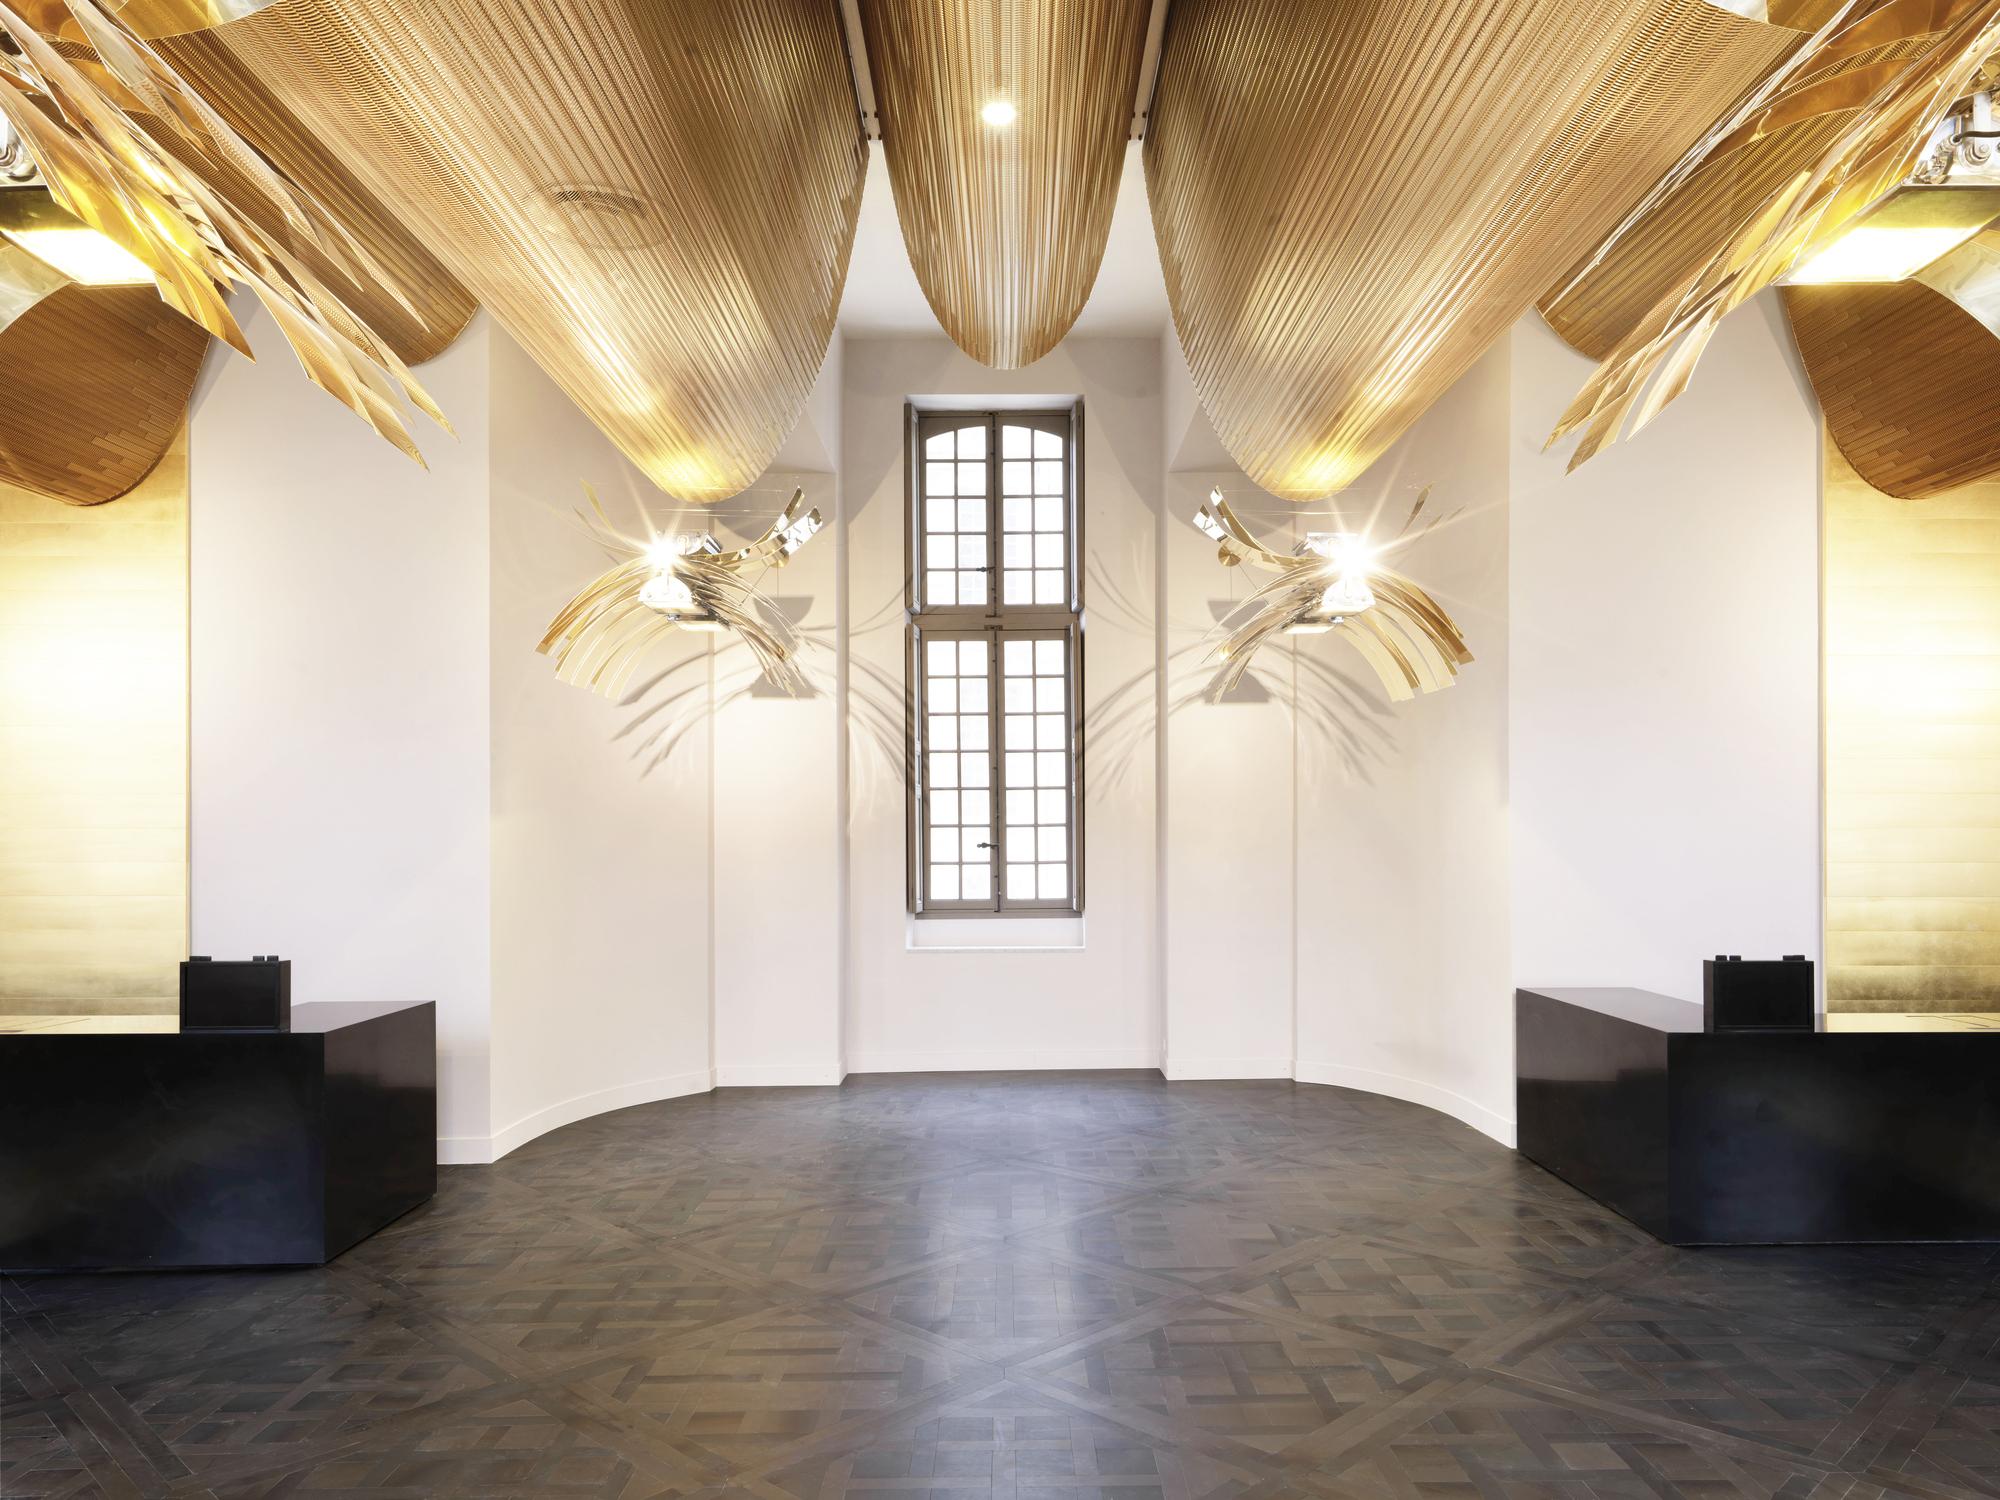 galeria de reforma do pavilh o dufour ch teau de versailles dominique perrault architecte 2. Black Bedroom Furniture Sets. Home Design Ideas